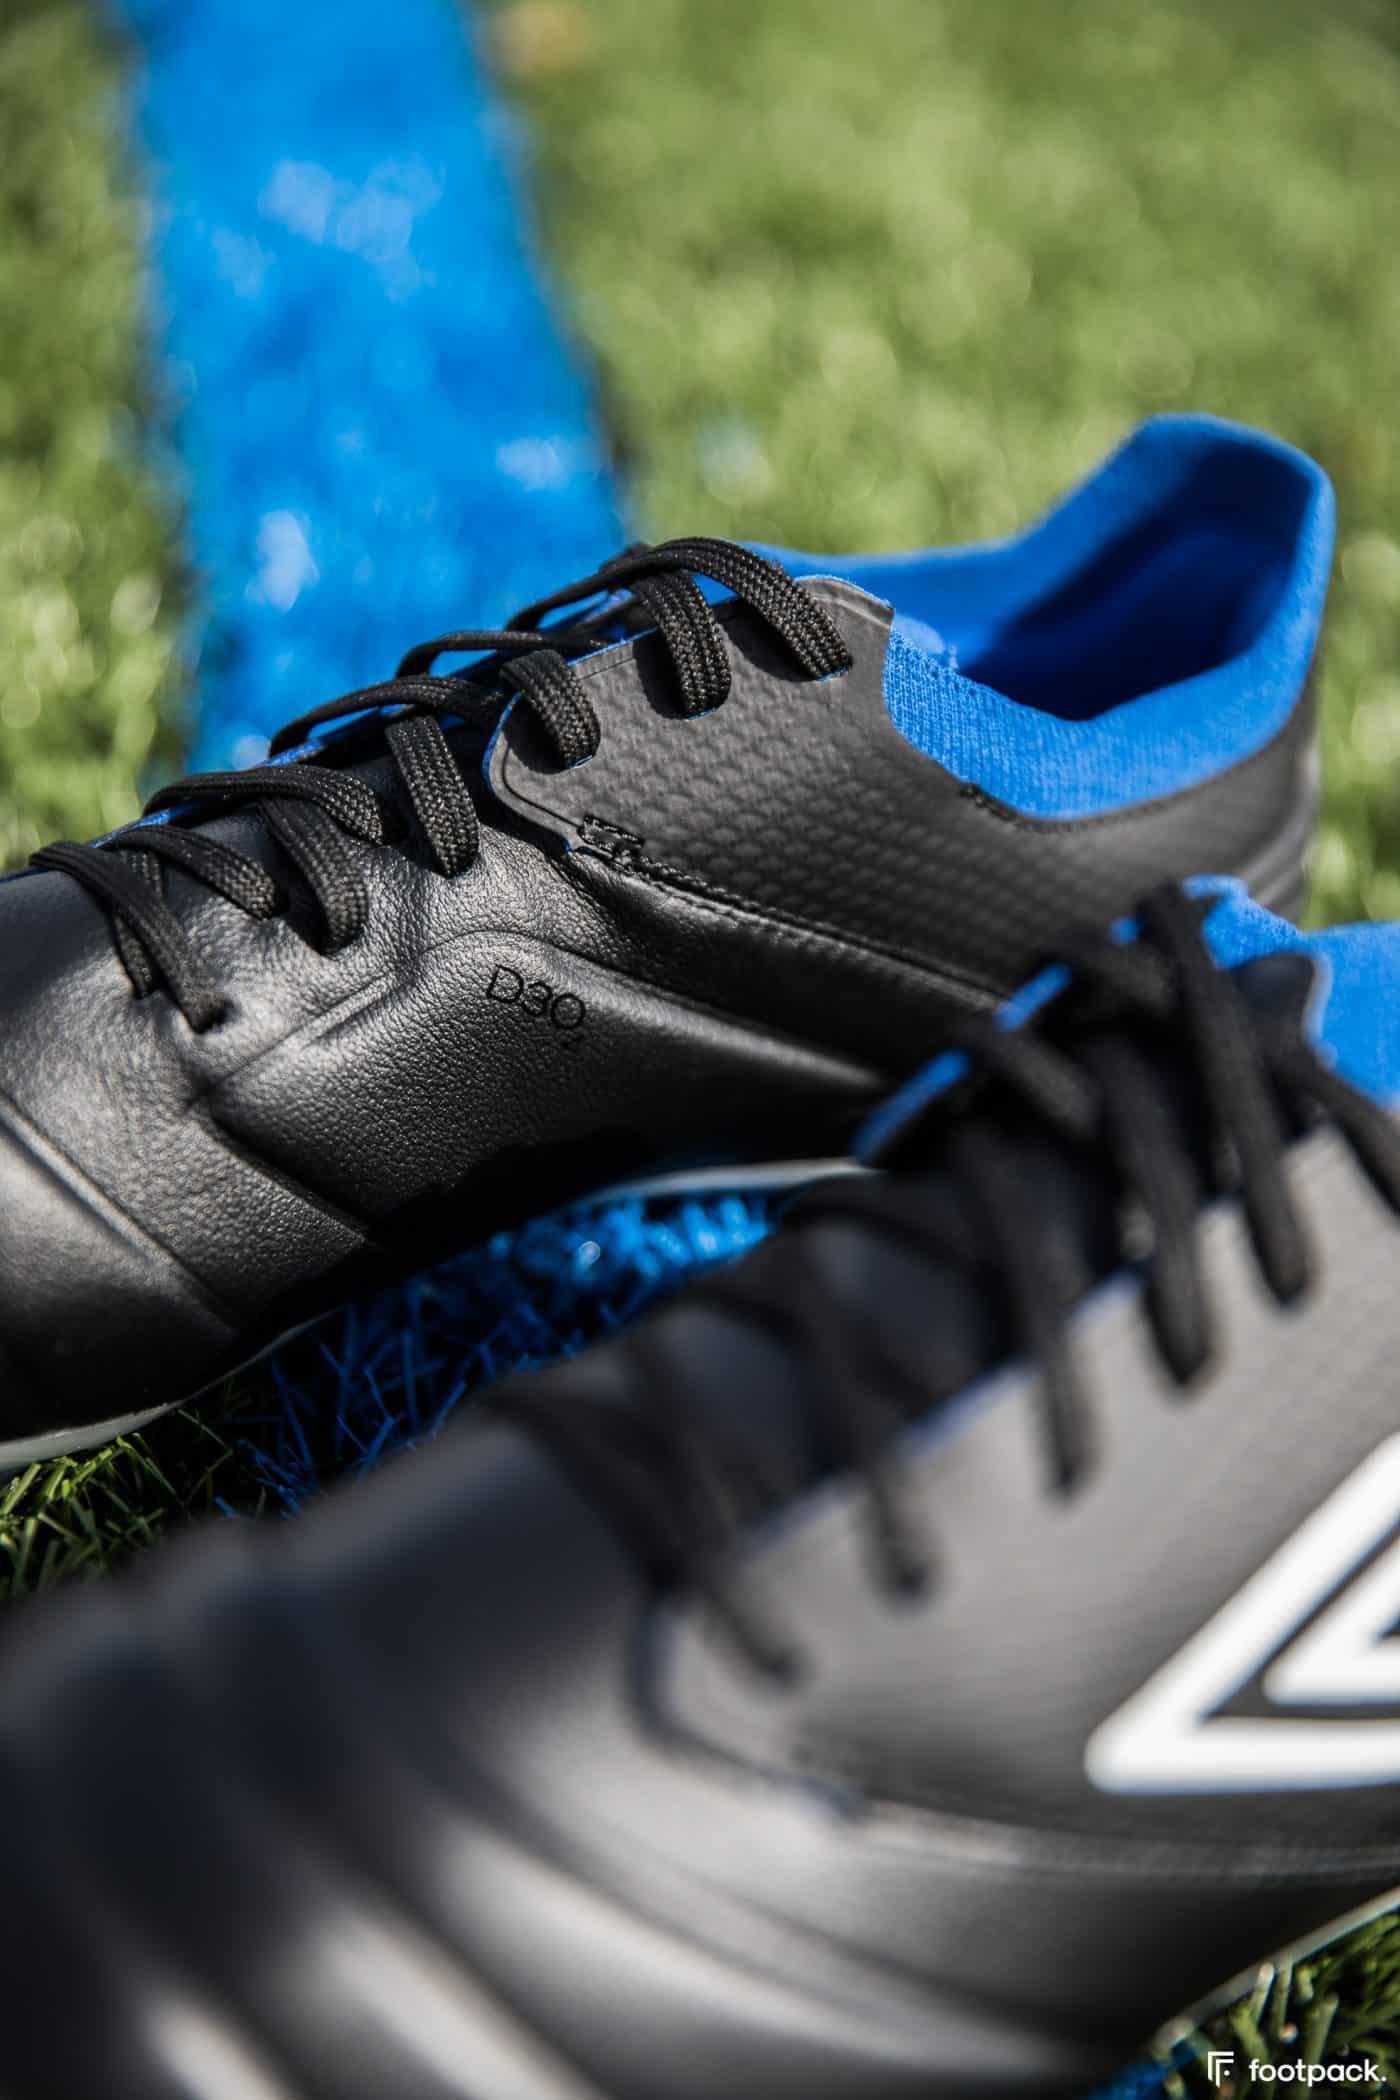 umbro-tocco-noir-bleu-2020-footpack-5